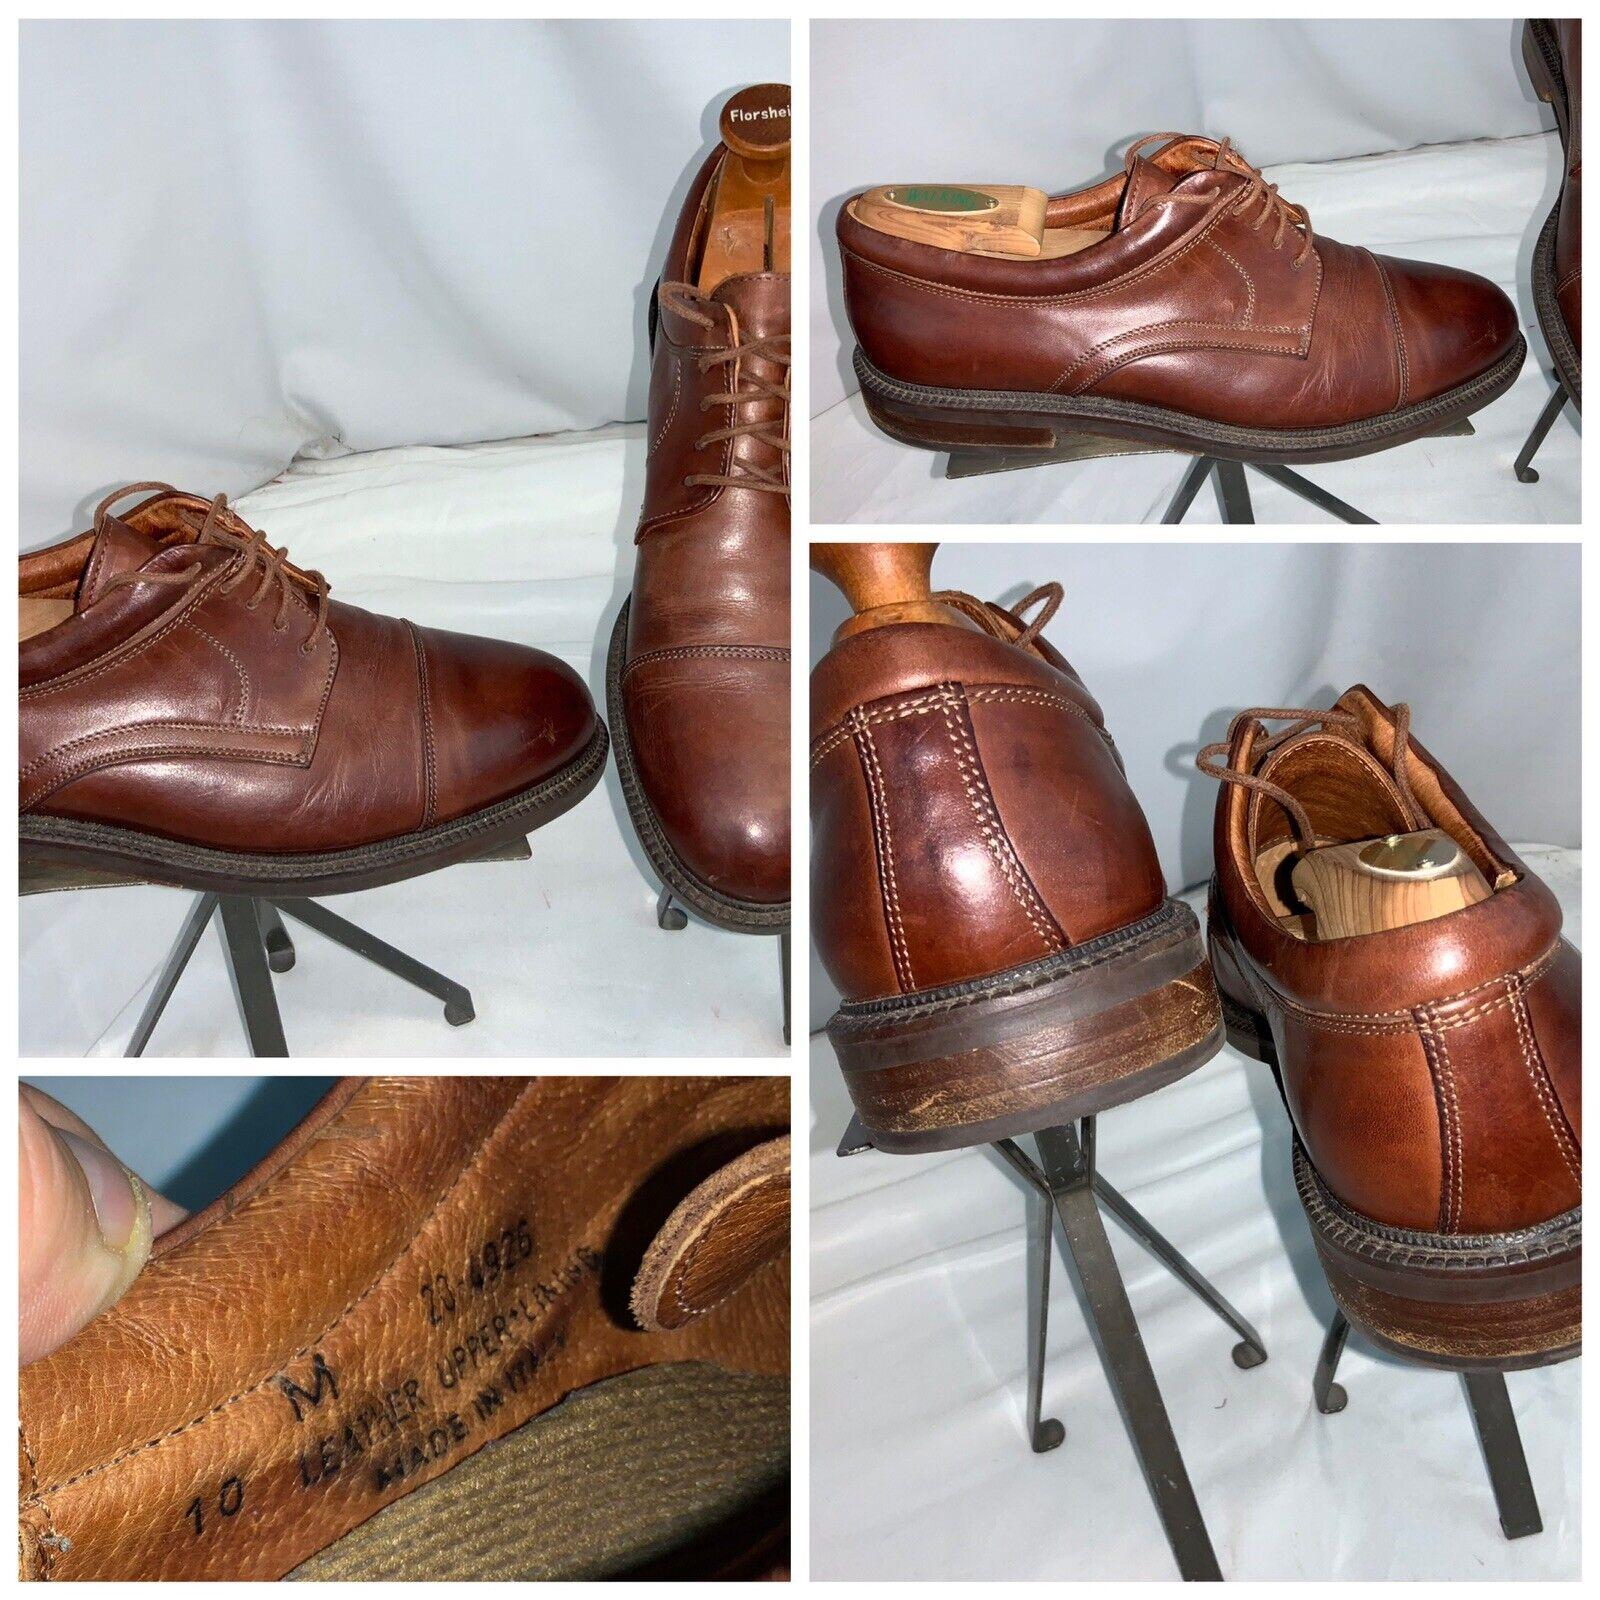 Johnston Murphy Cap Toe Oxford Shoes Sz 10 Men Brown Italy Mint YGI G0S-187